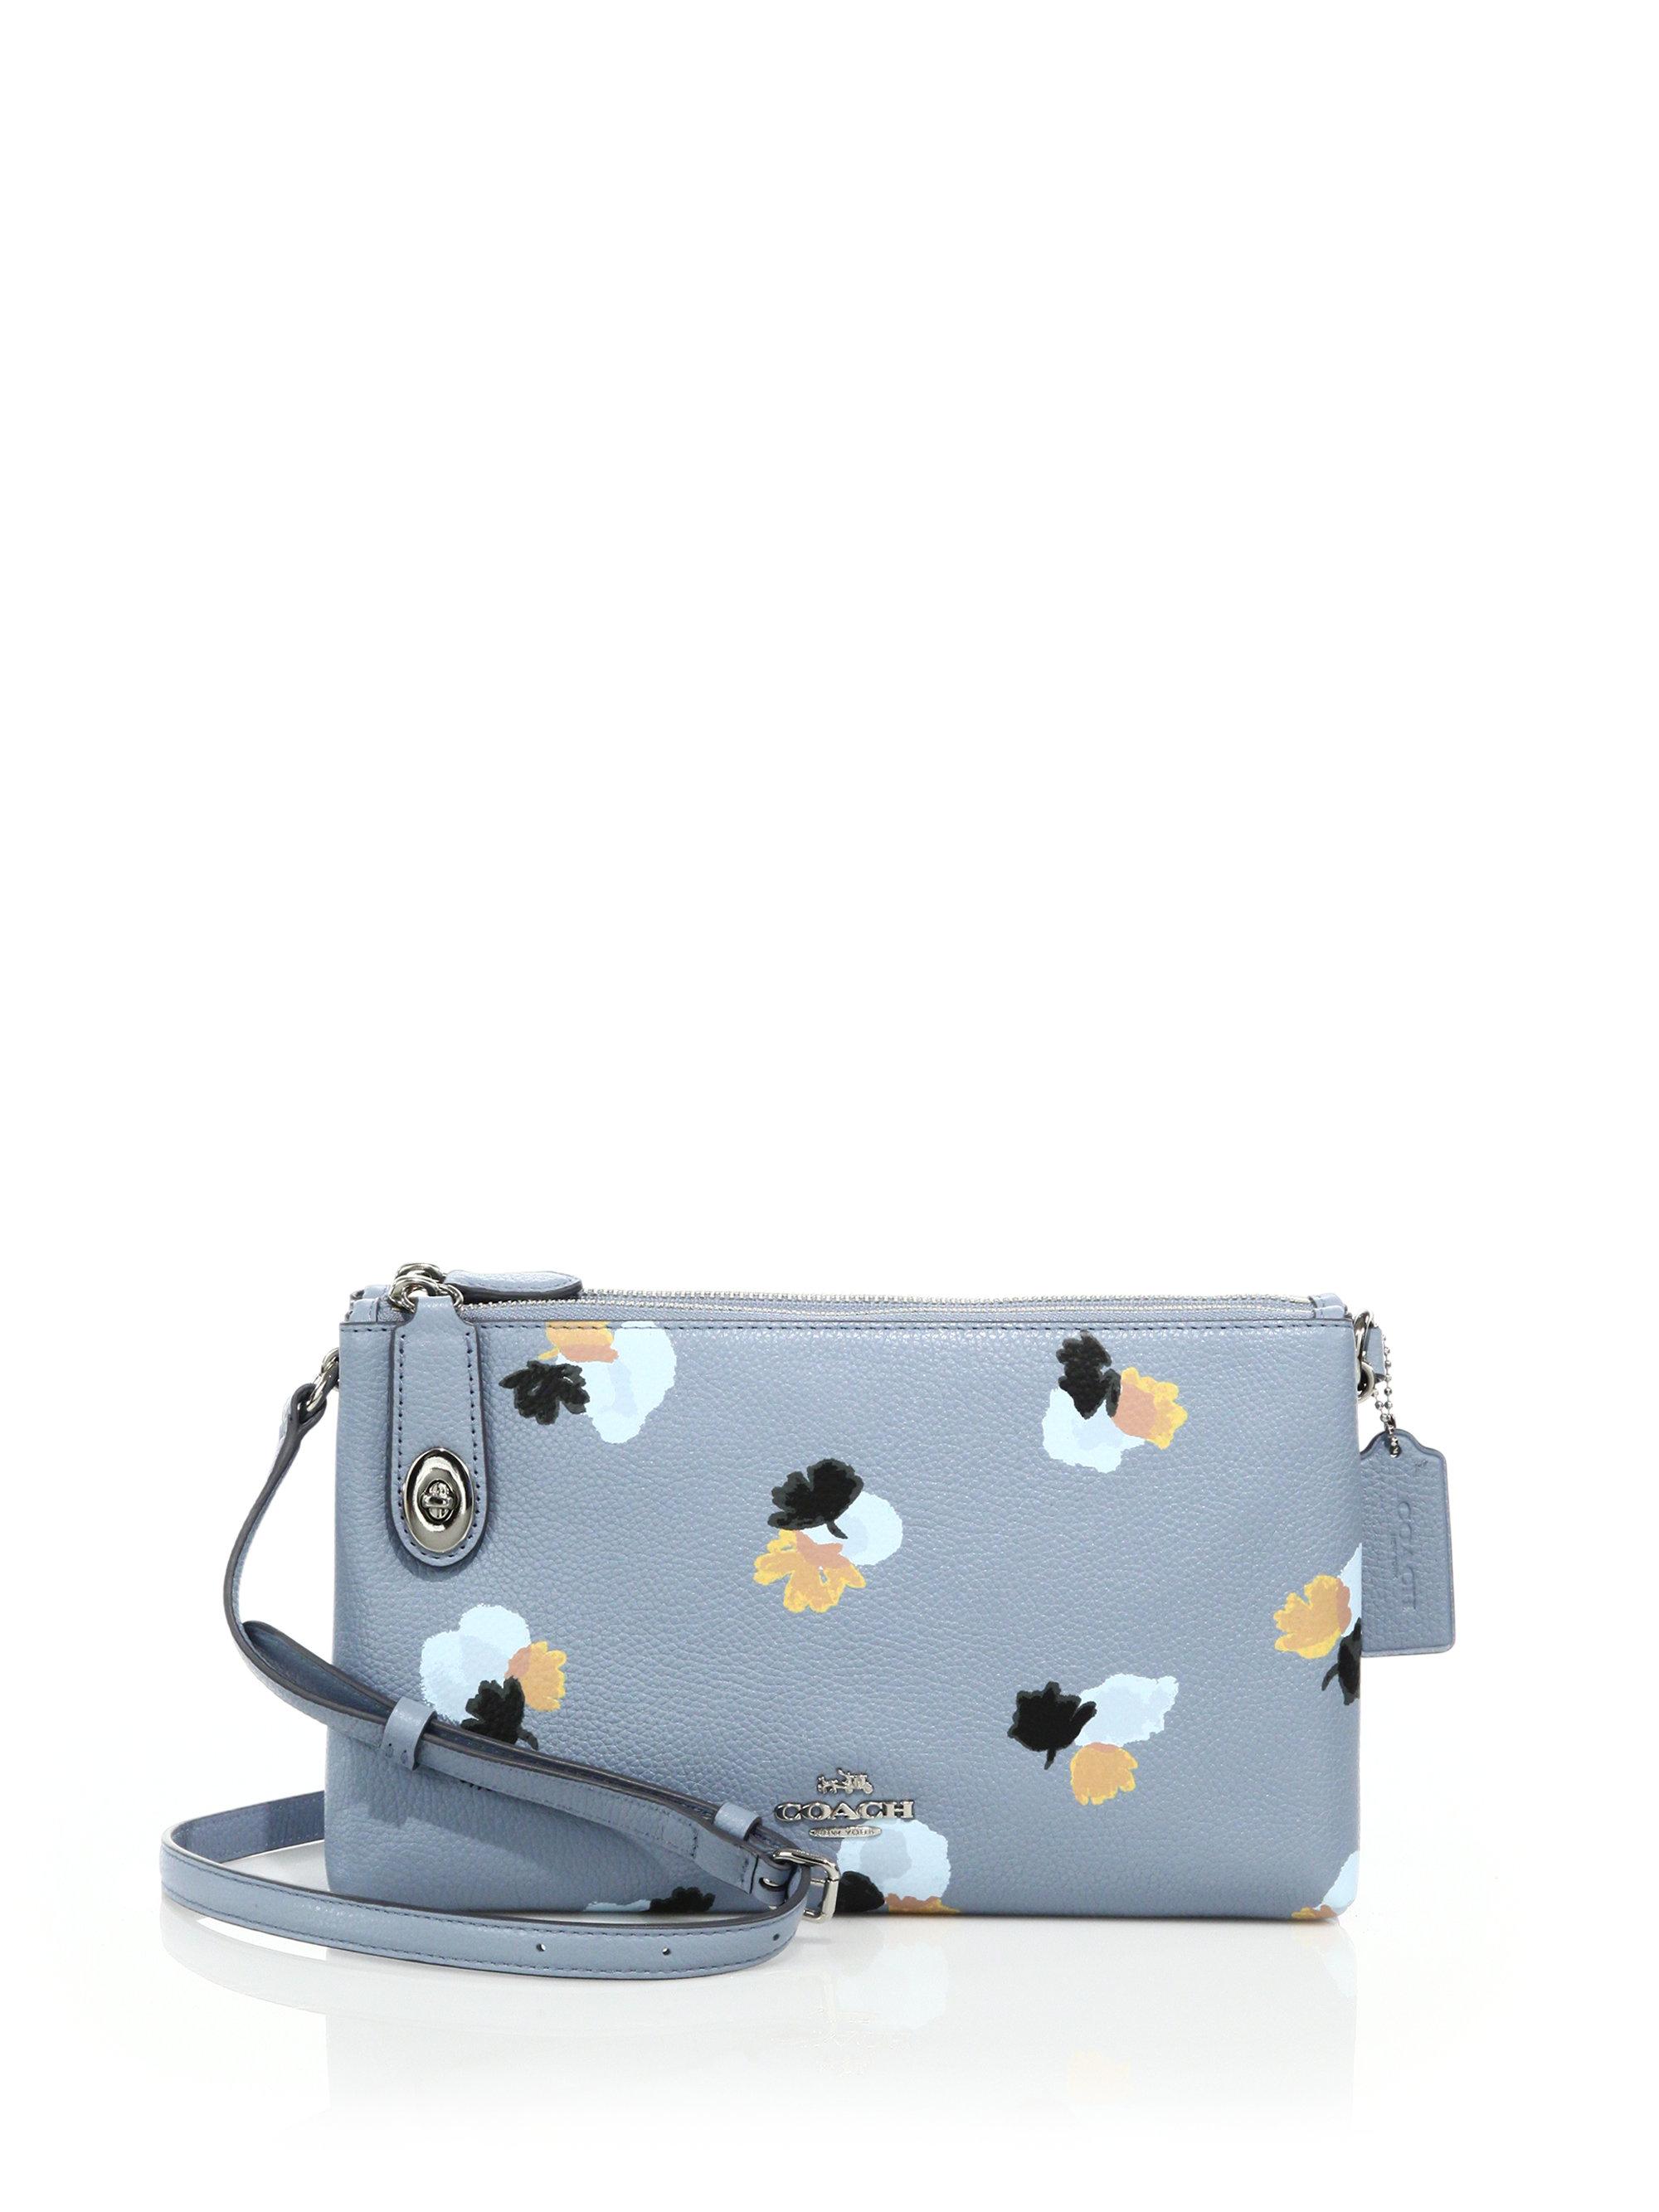 ... norway lyst coach crosby floral print leather crossbody bag in blue  4e994 f624a 645ab57687794